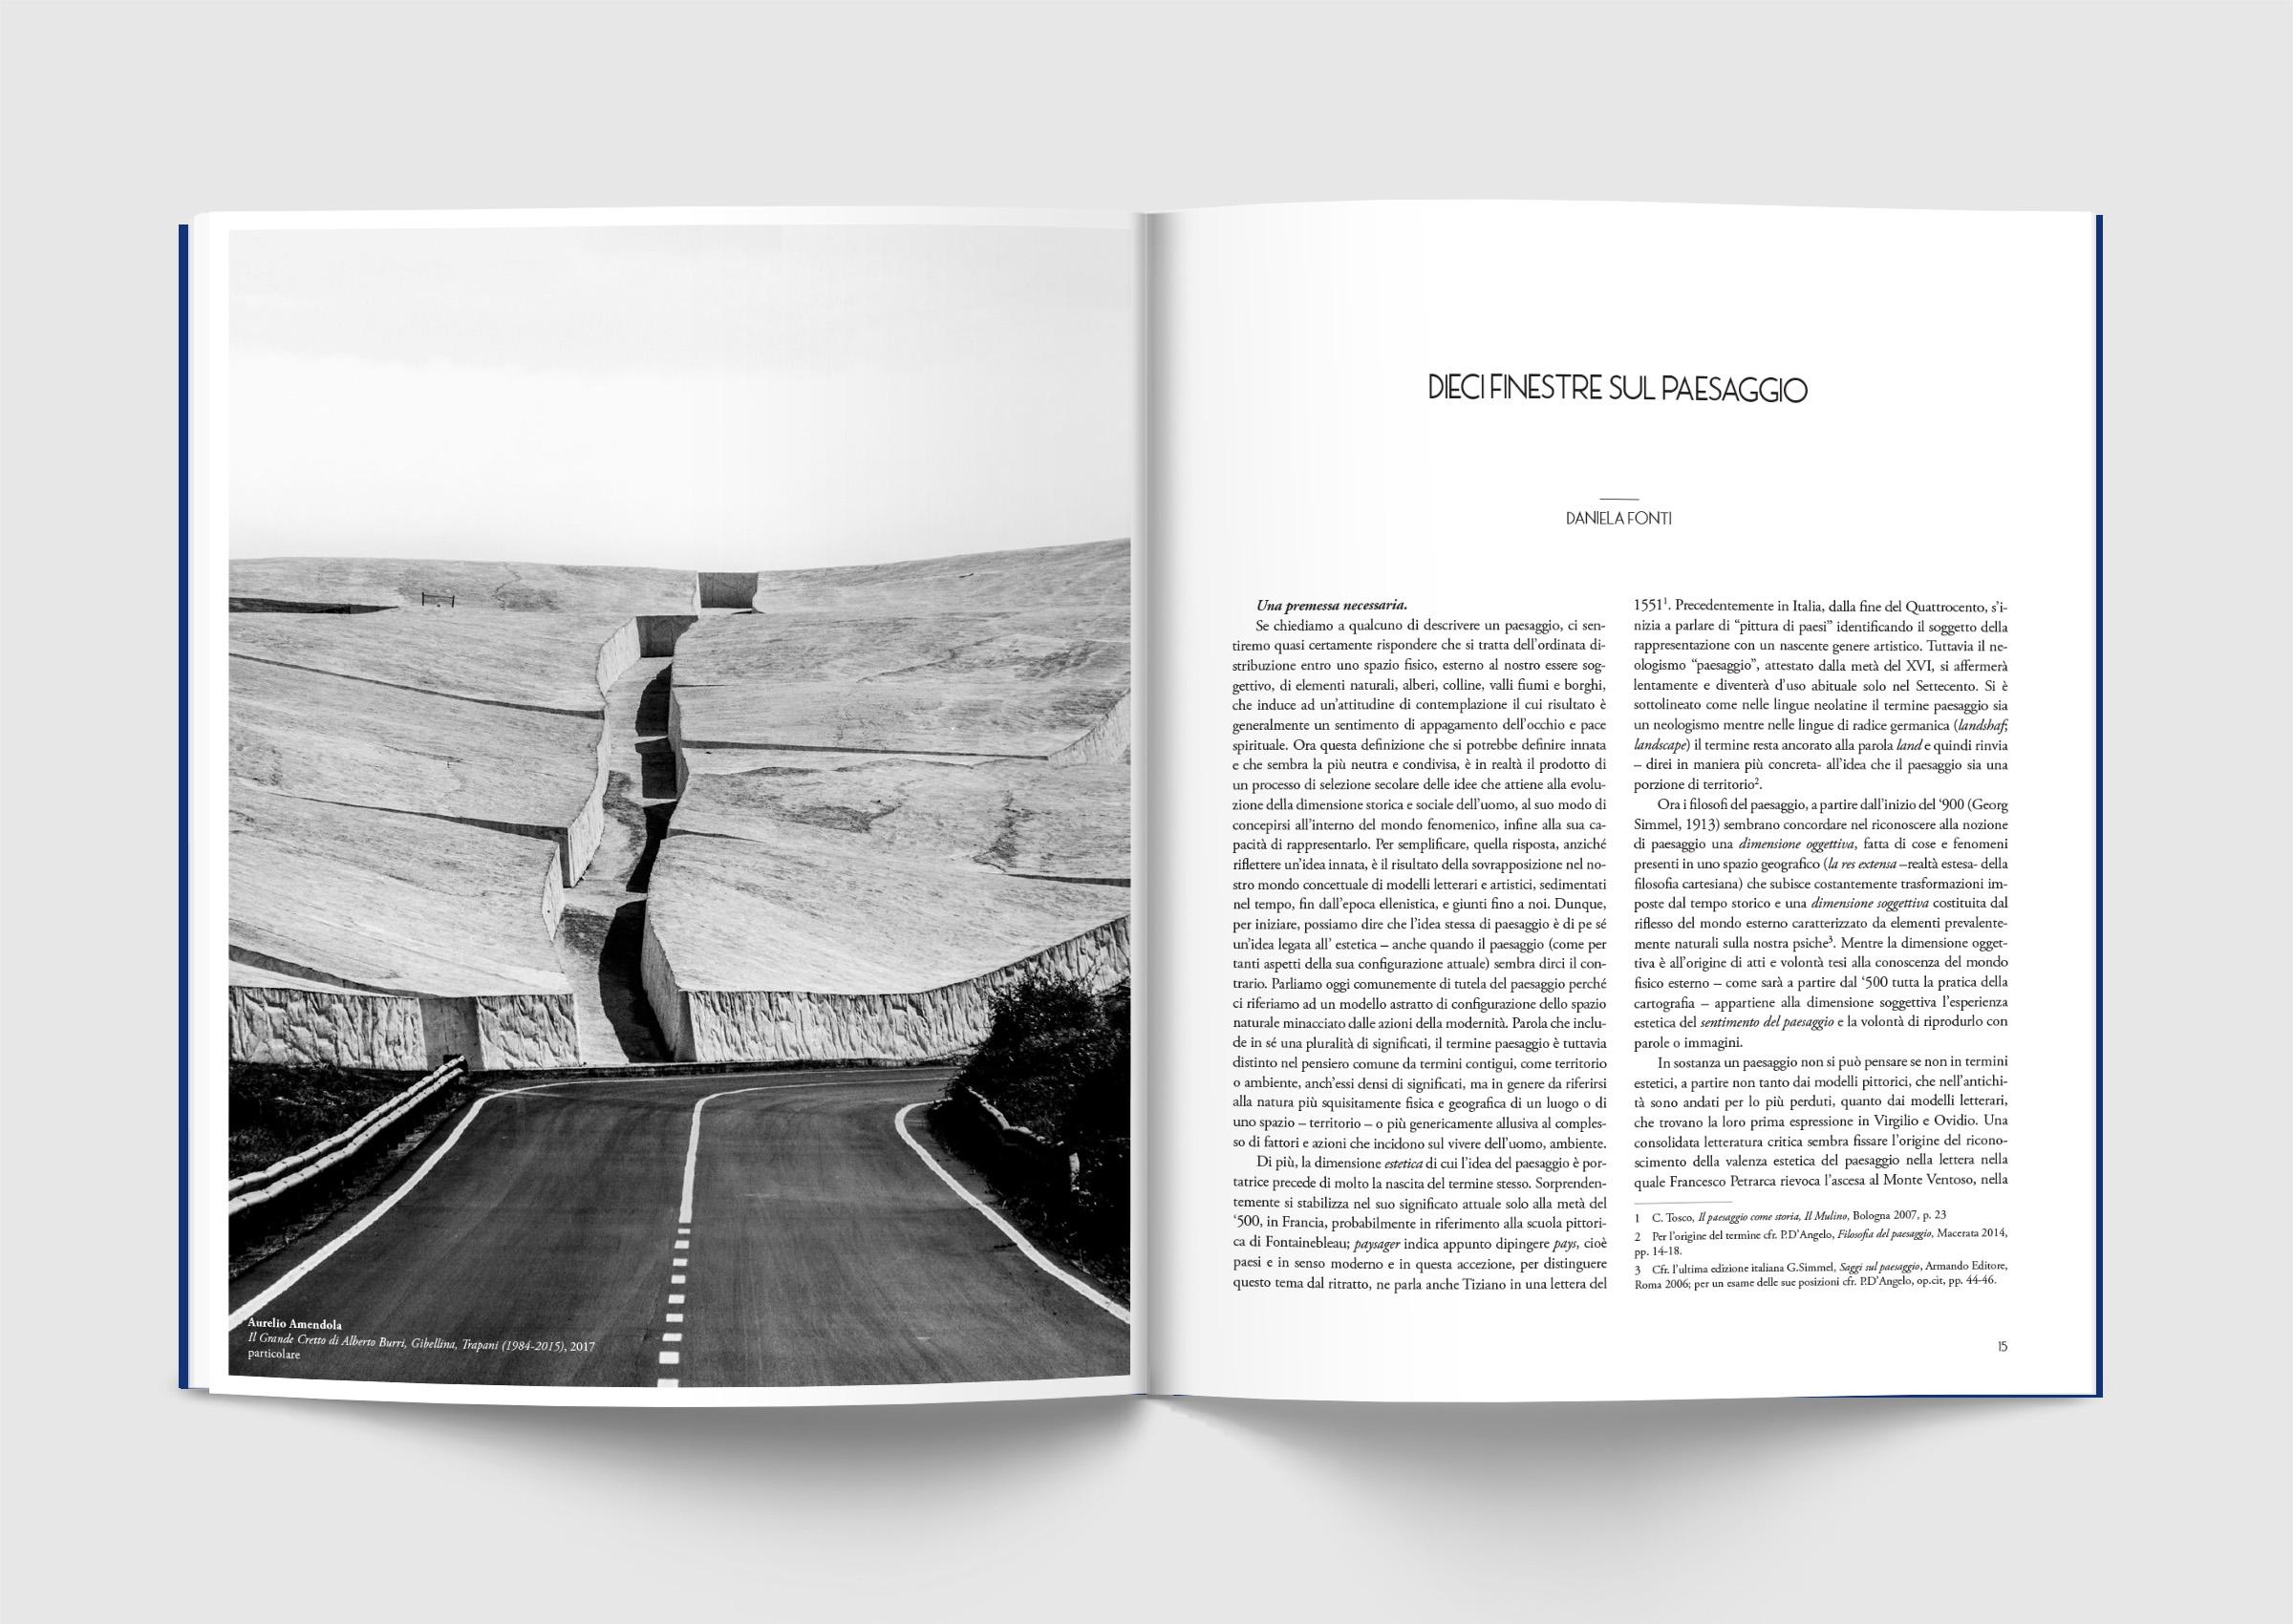 Catalogo Mostra, Arcadia Apocalisse, Palp, Pontedera, Design, Deferrari Modesti, Amendola